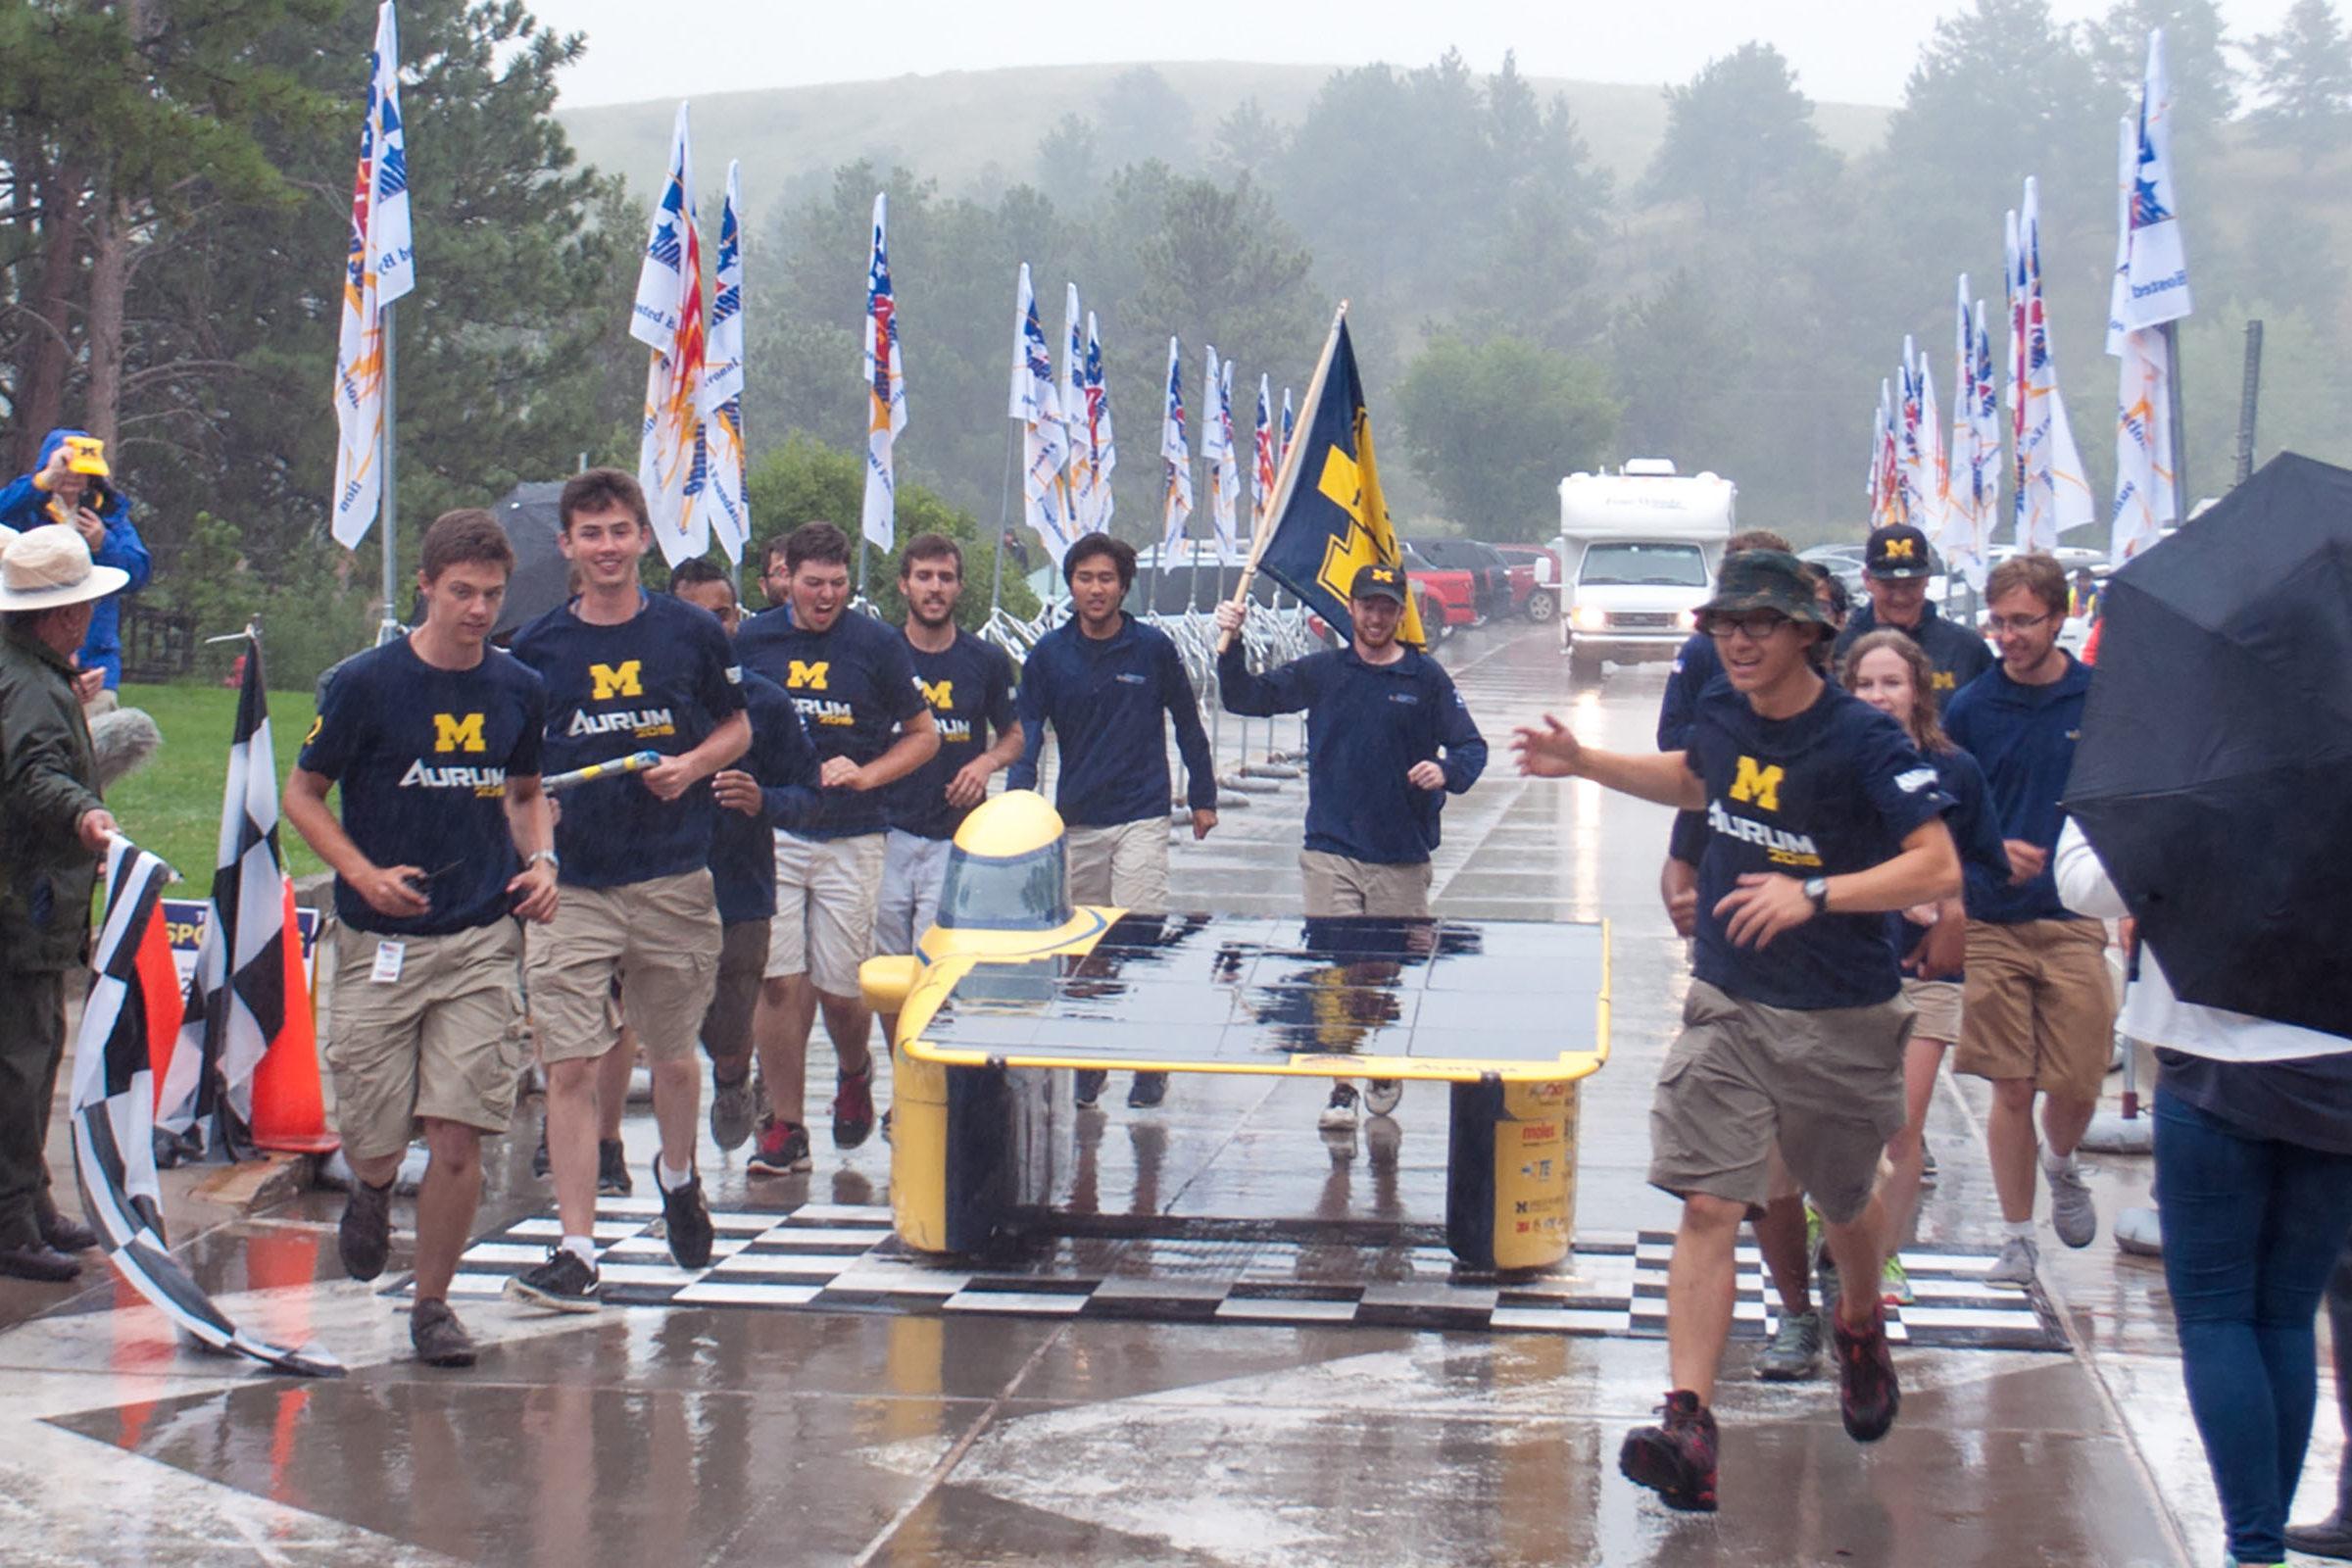 Members of the Michigan Solar Car team run across a finish line alongside their car, Aurum, in the rain.